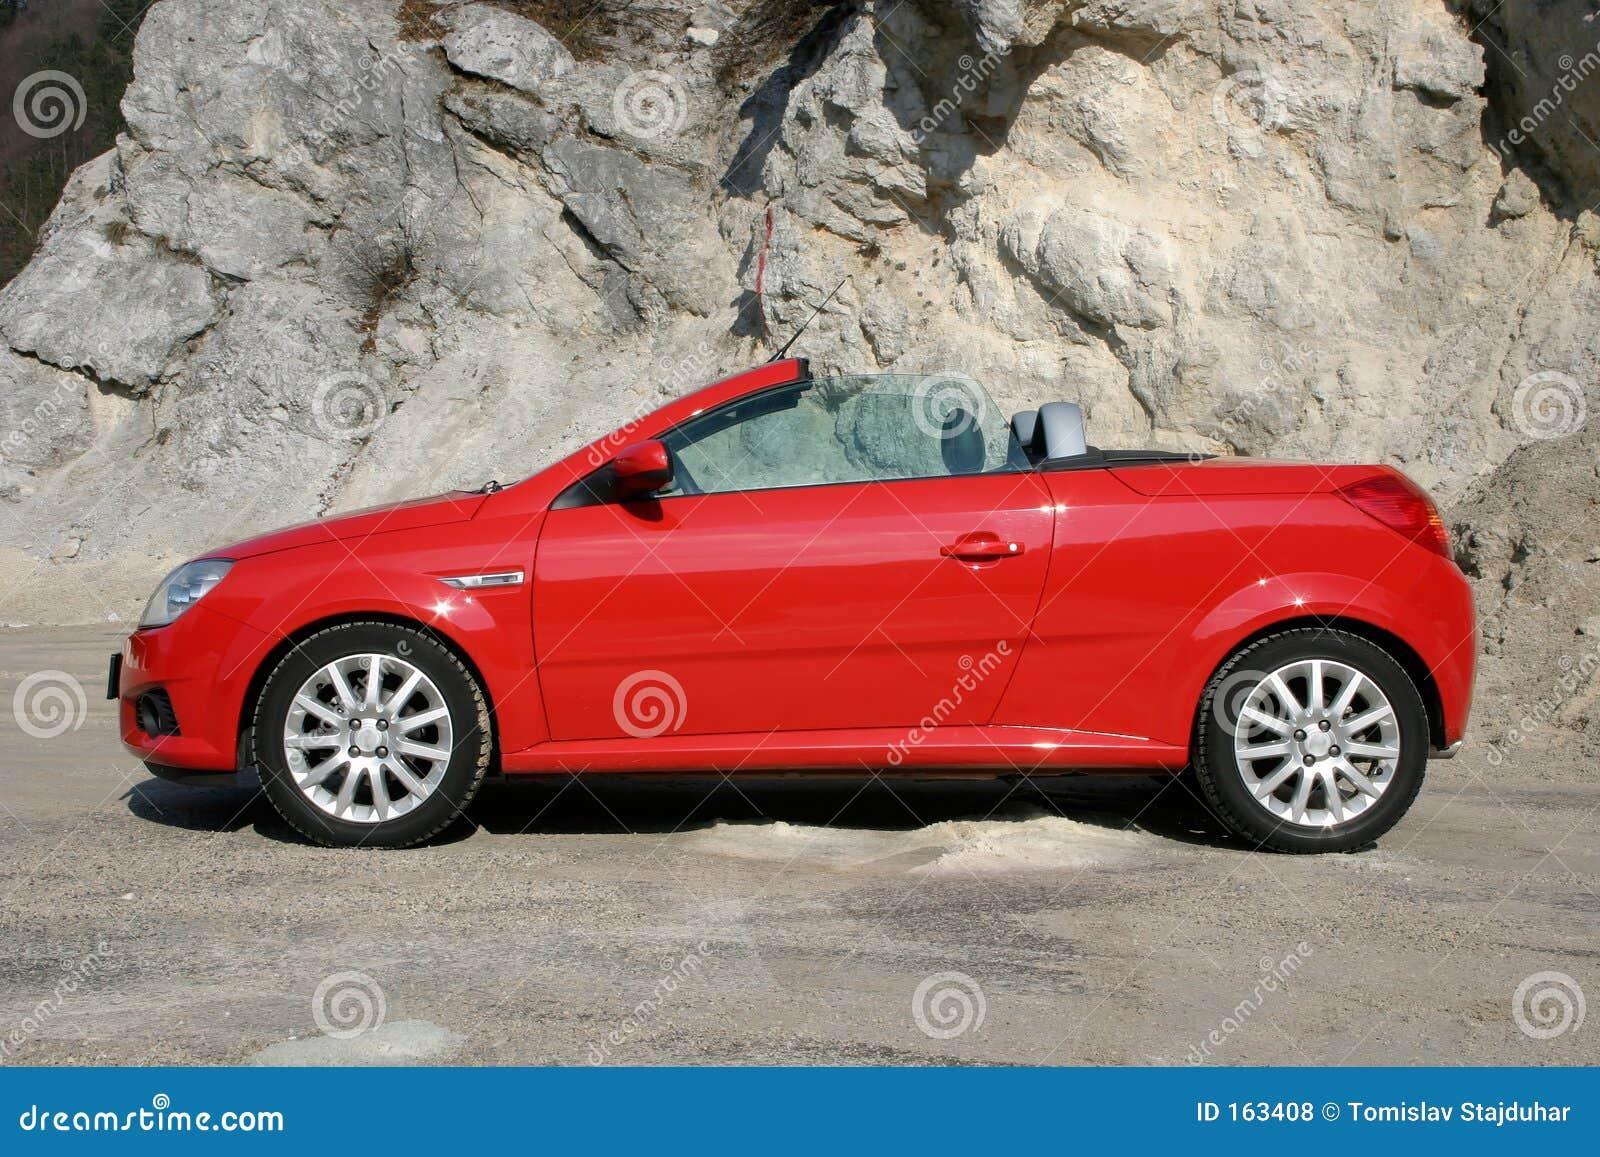 Open top sports car